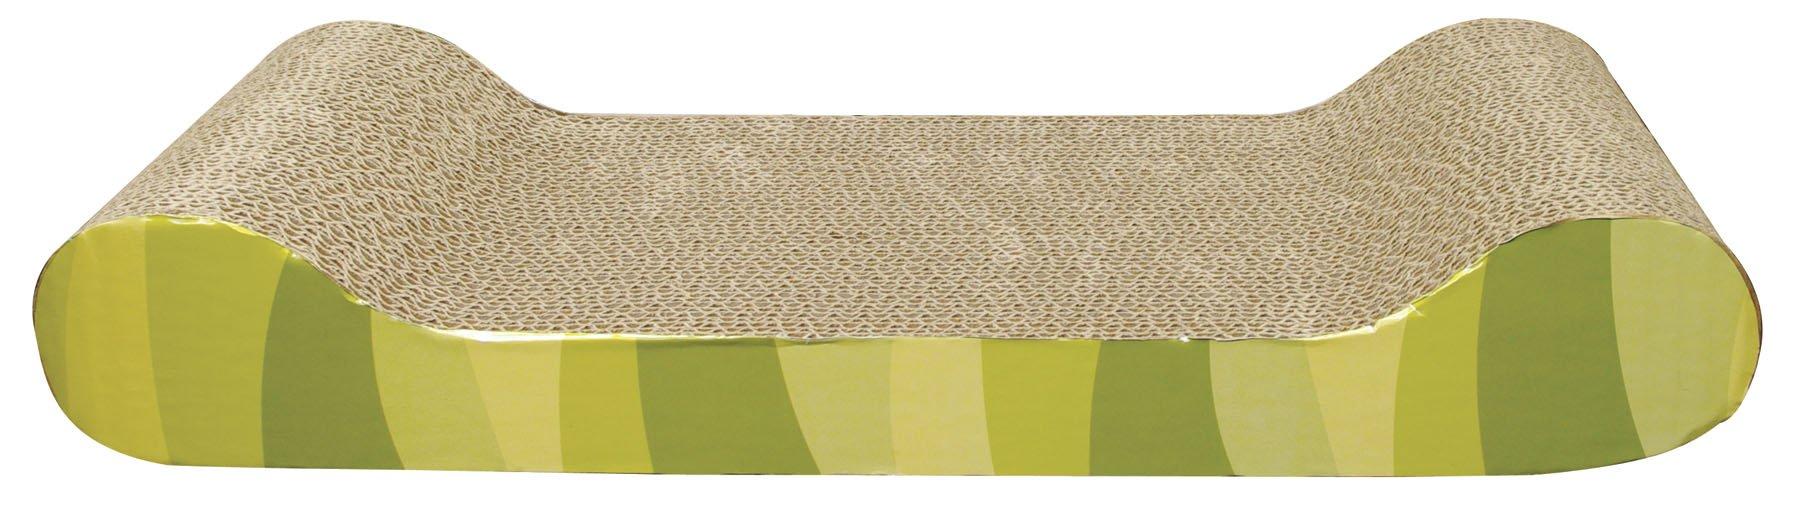 Catit Griffoir Carton Ondulé 49x22x75 cm